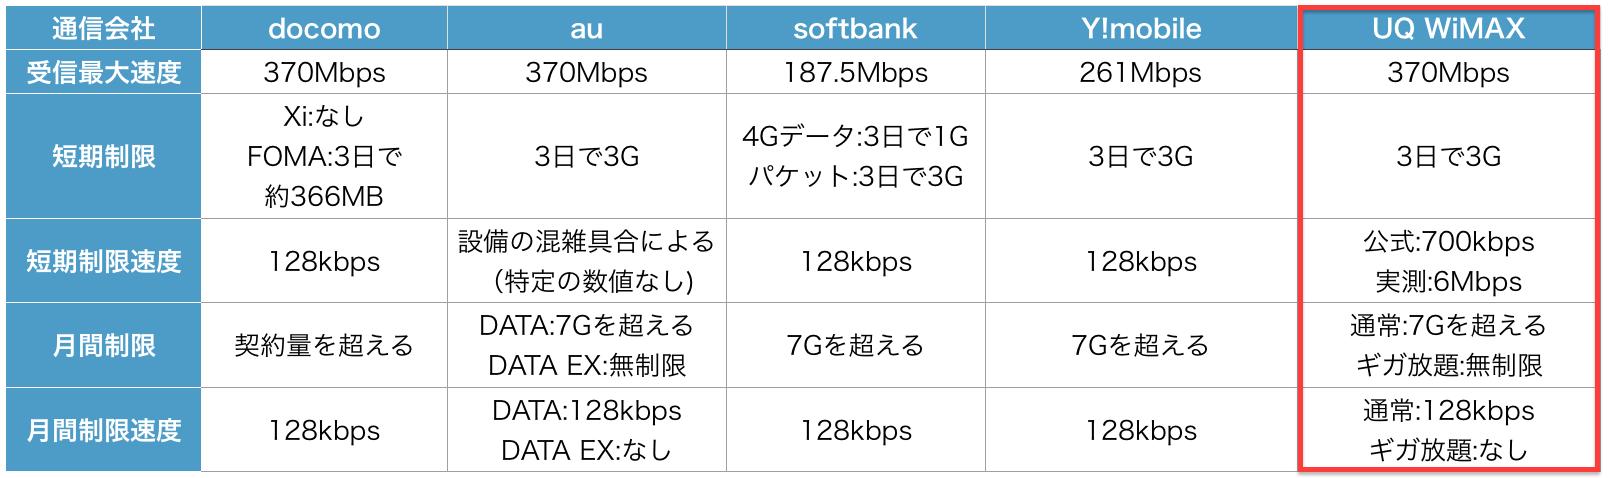 Pocket WiFi 504HW Y!mobile データ通信端末 比較